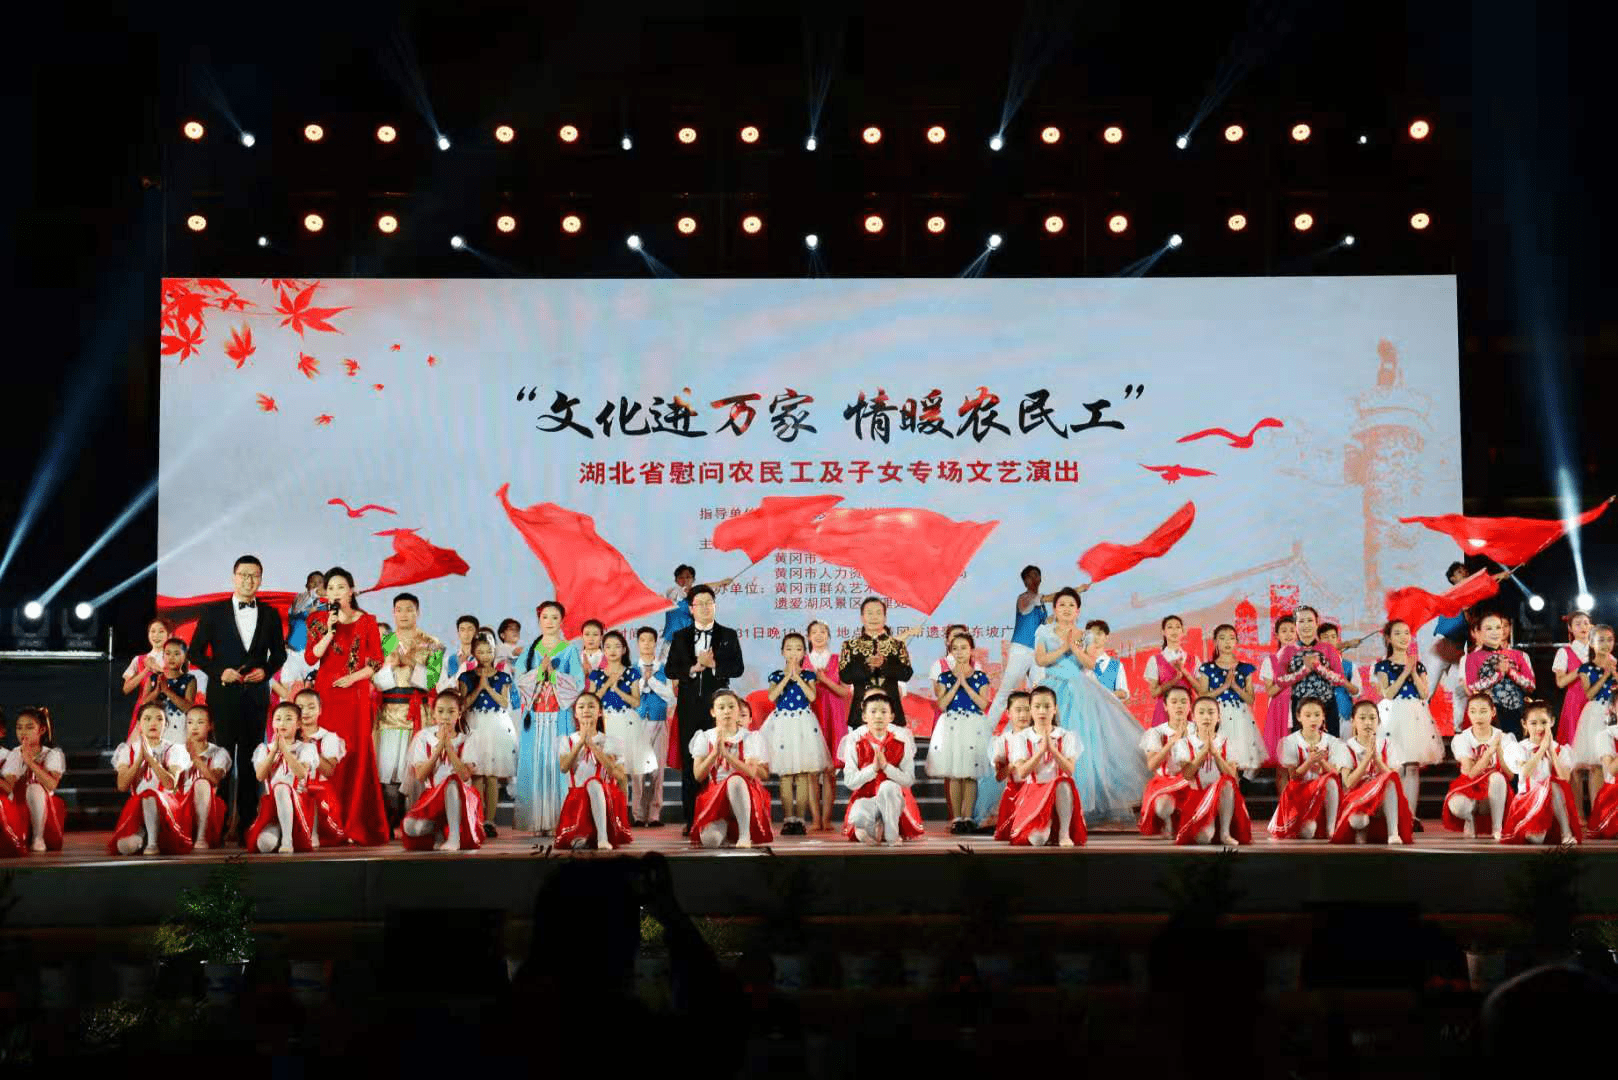 http://www.jldlk.cn/wenhua/180349.html